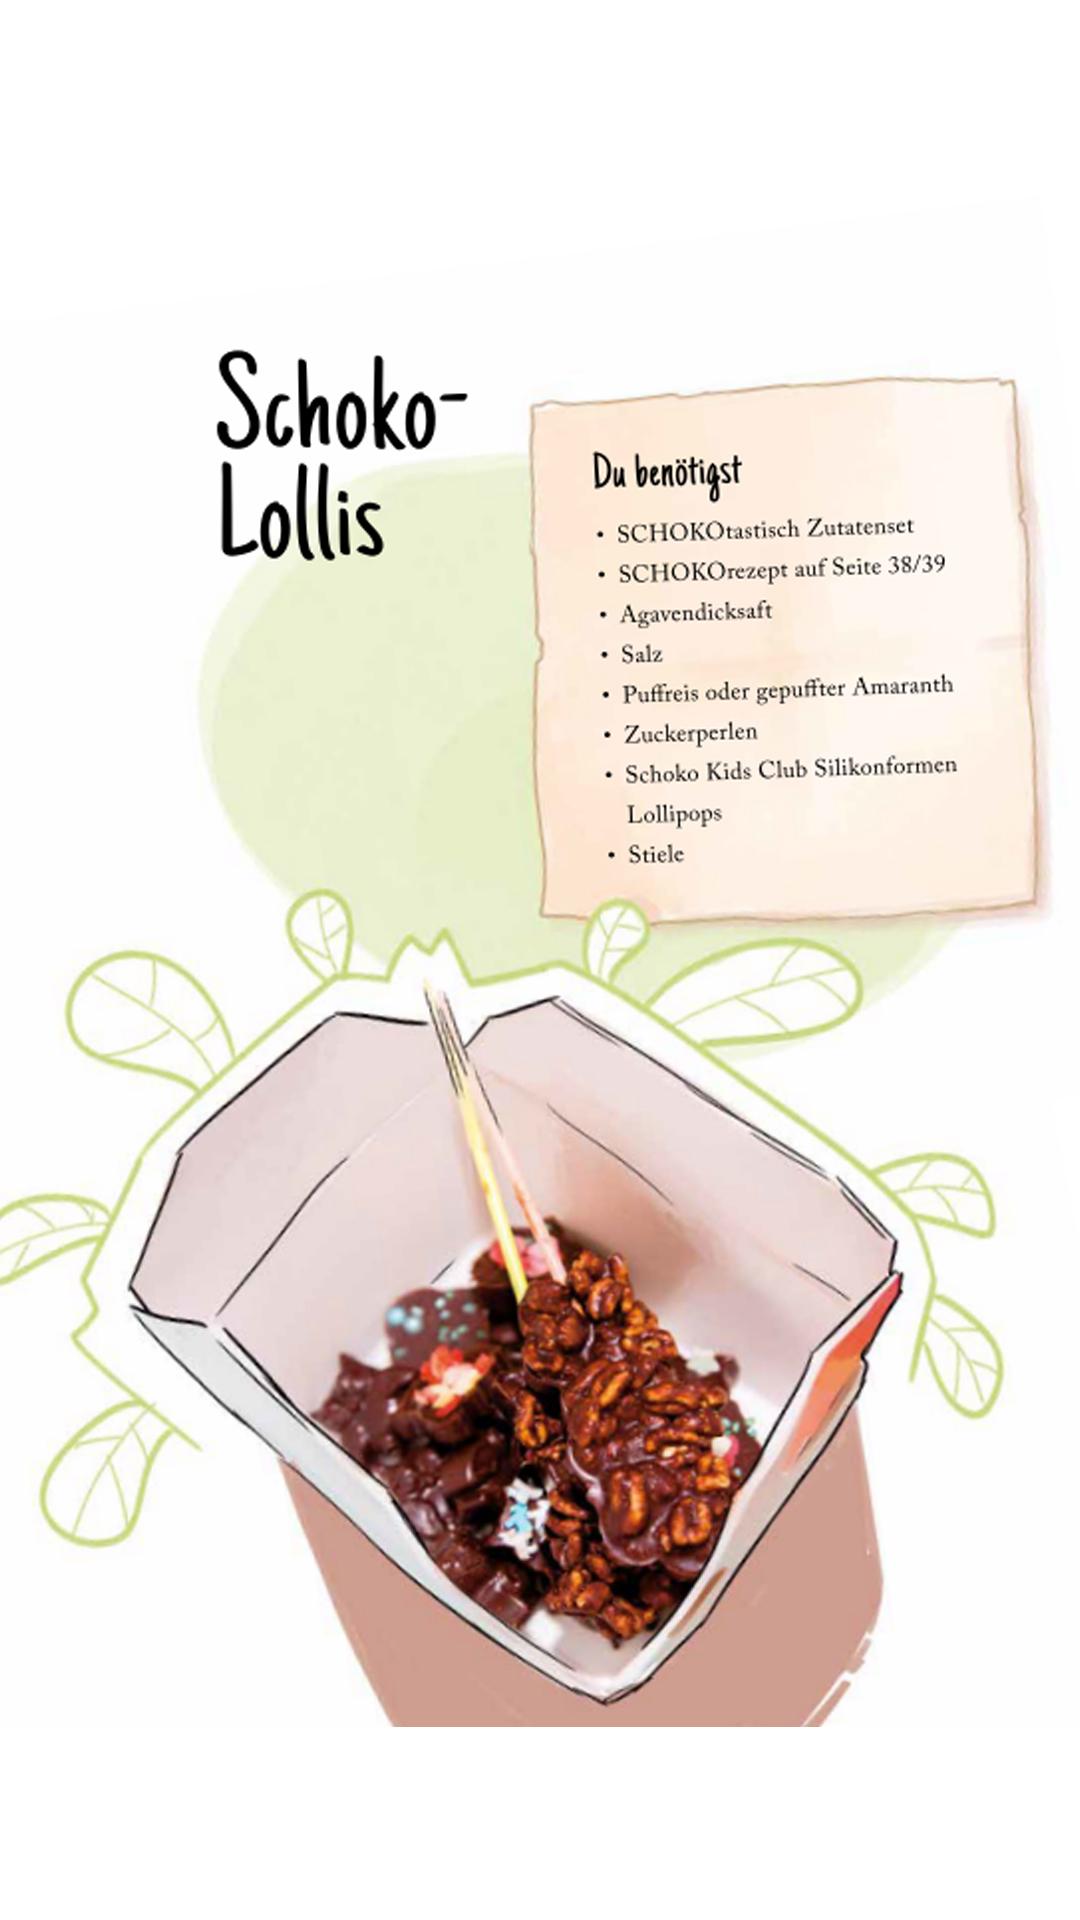 Schoko-Lollis